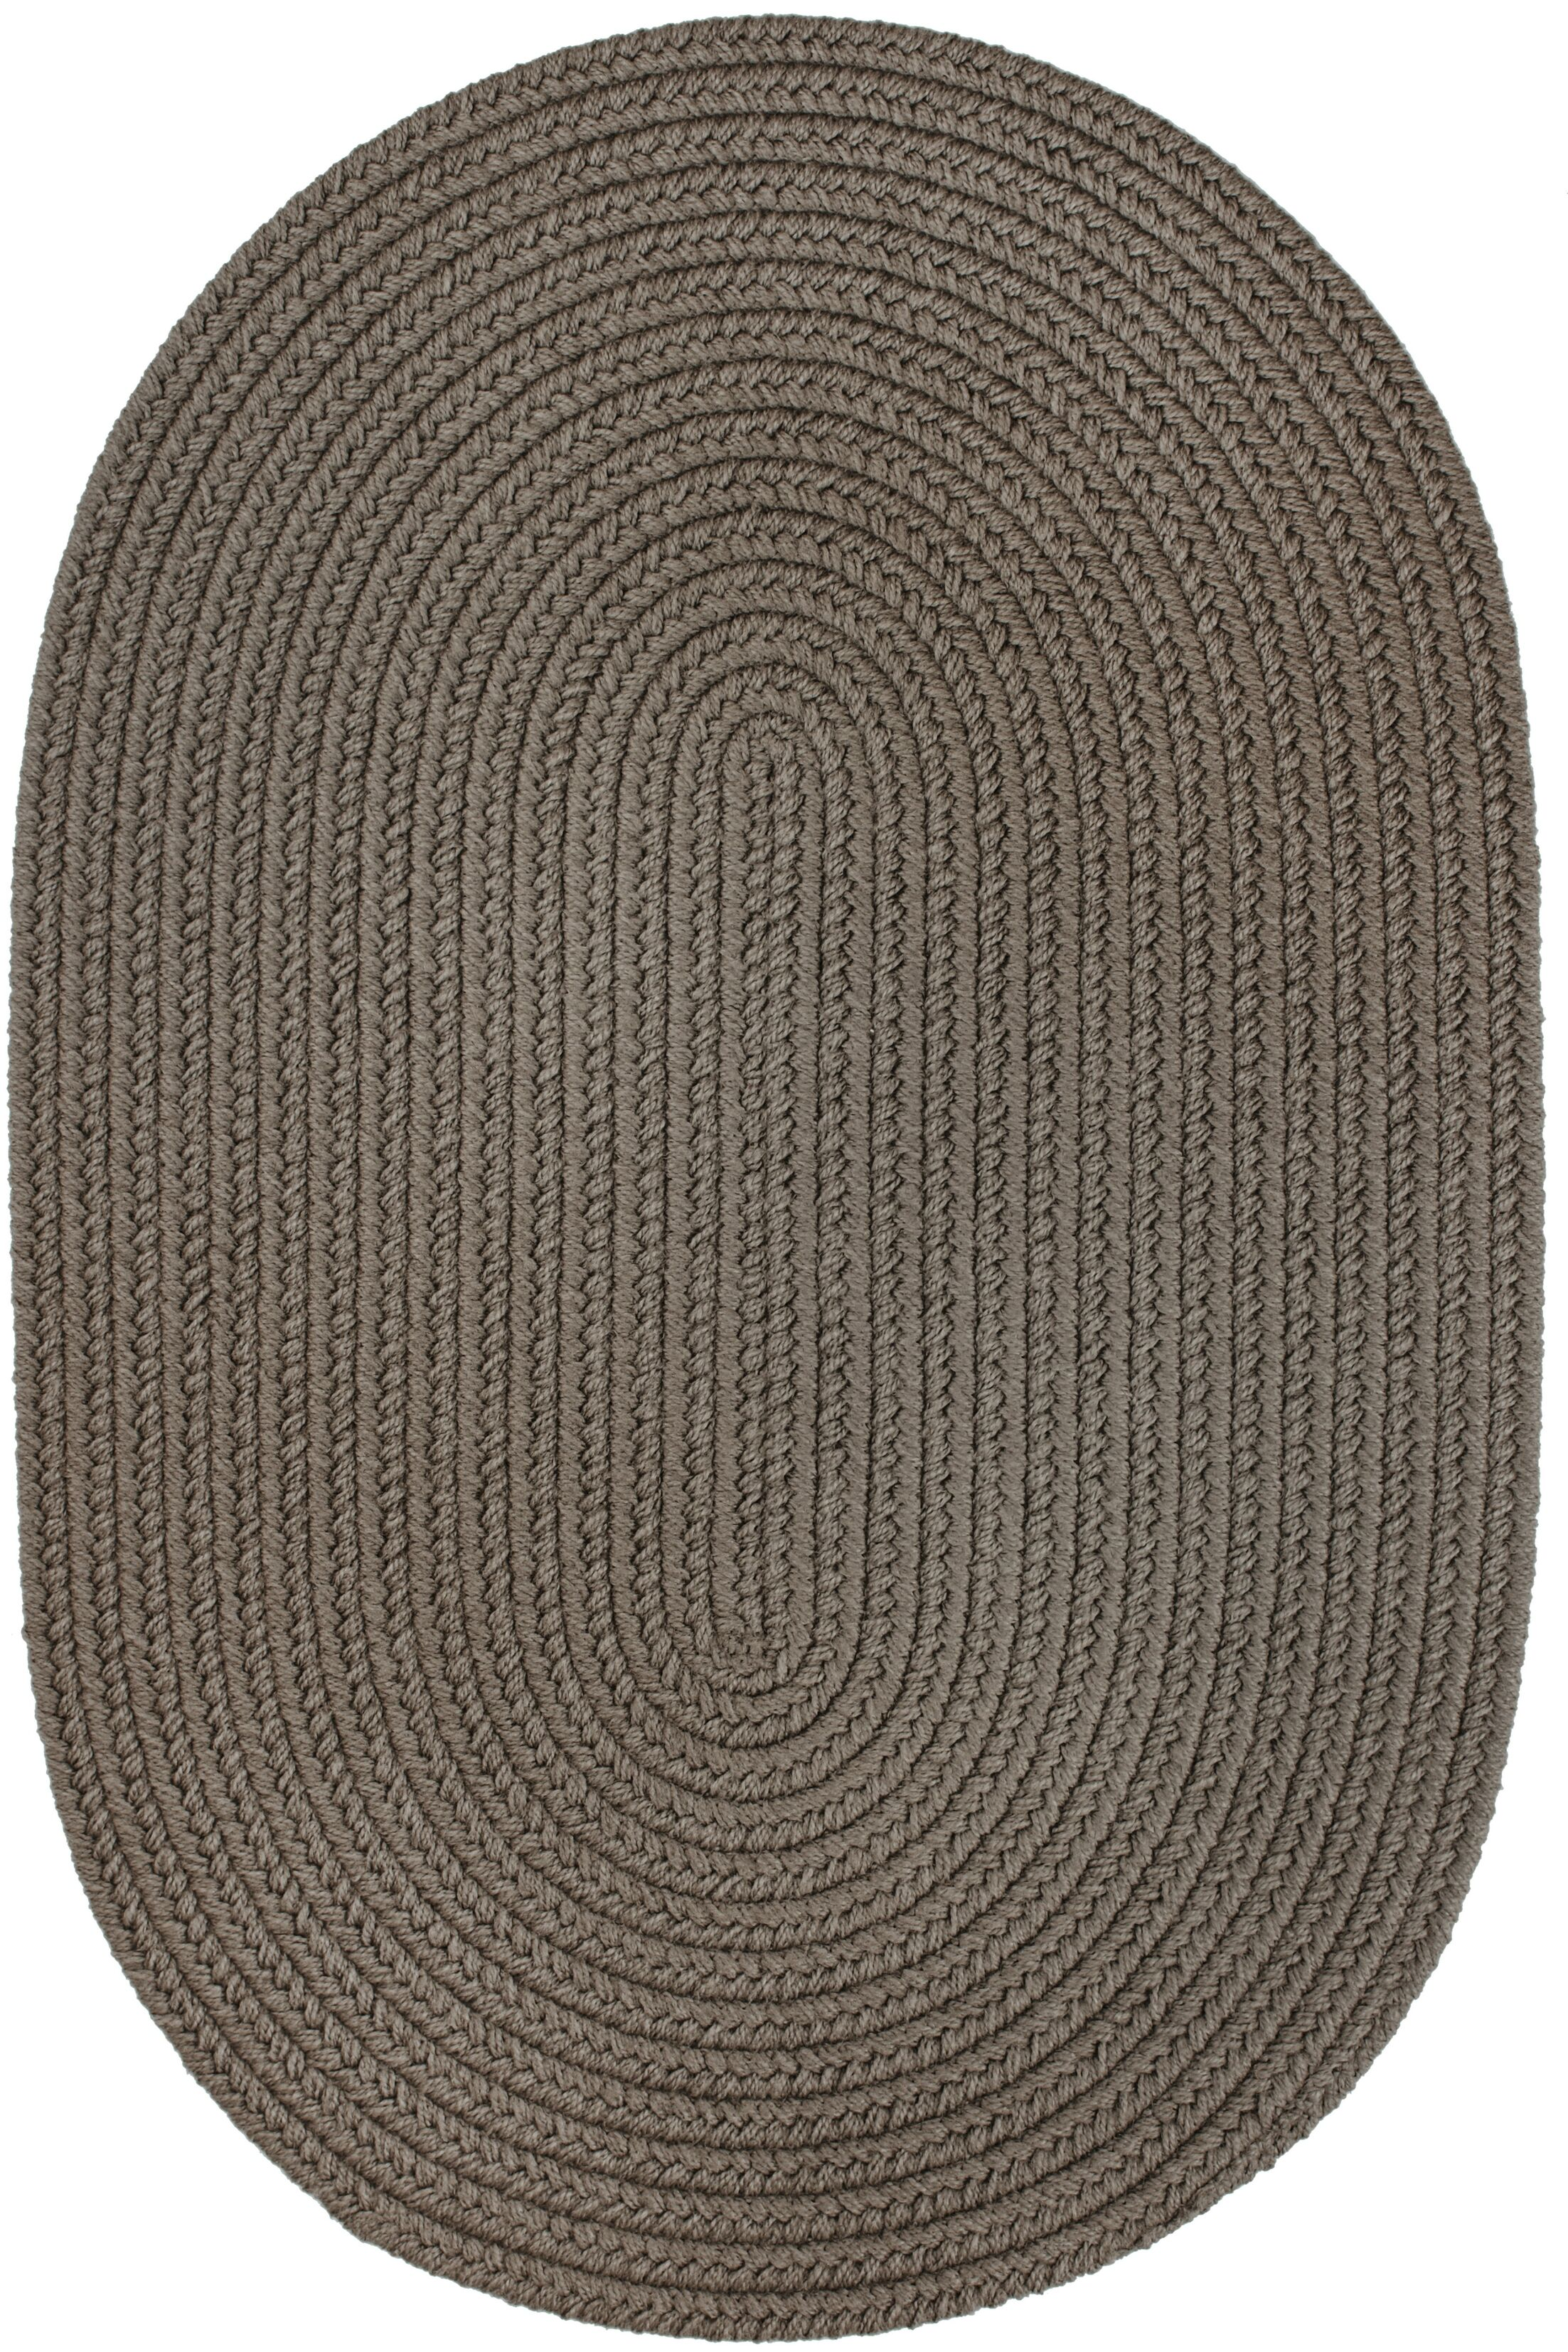 Handmade Gray Indoor/Outdoor Area Rug Rug Size: Oval 8' x 11'